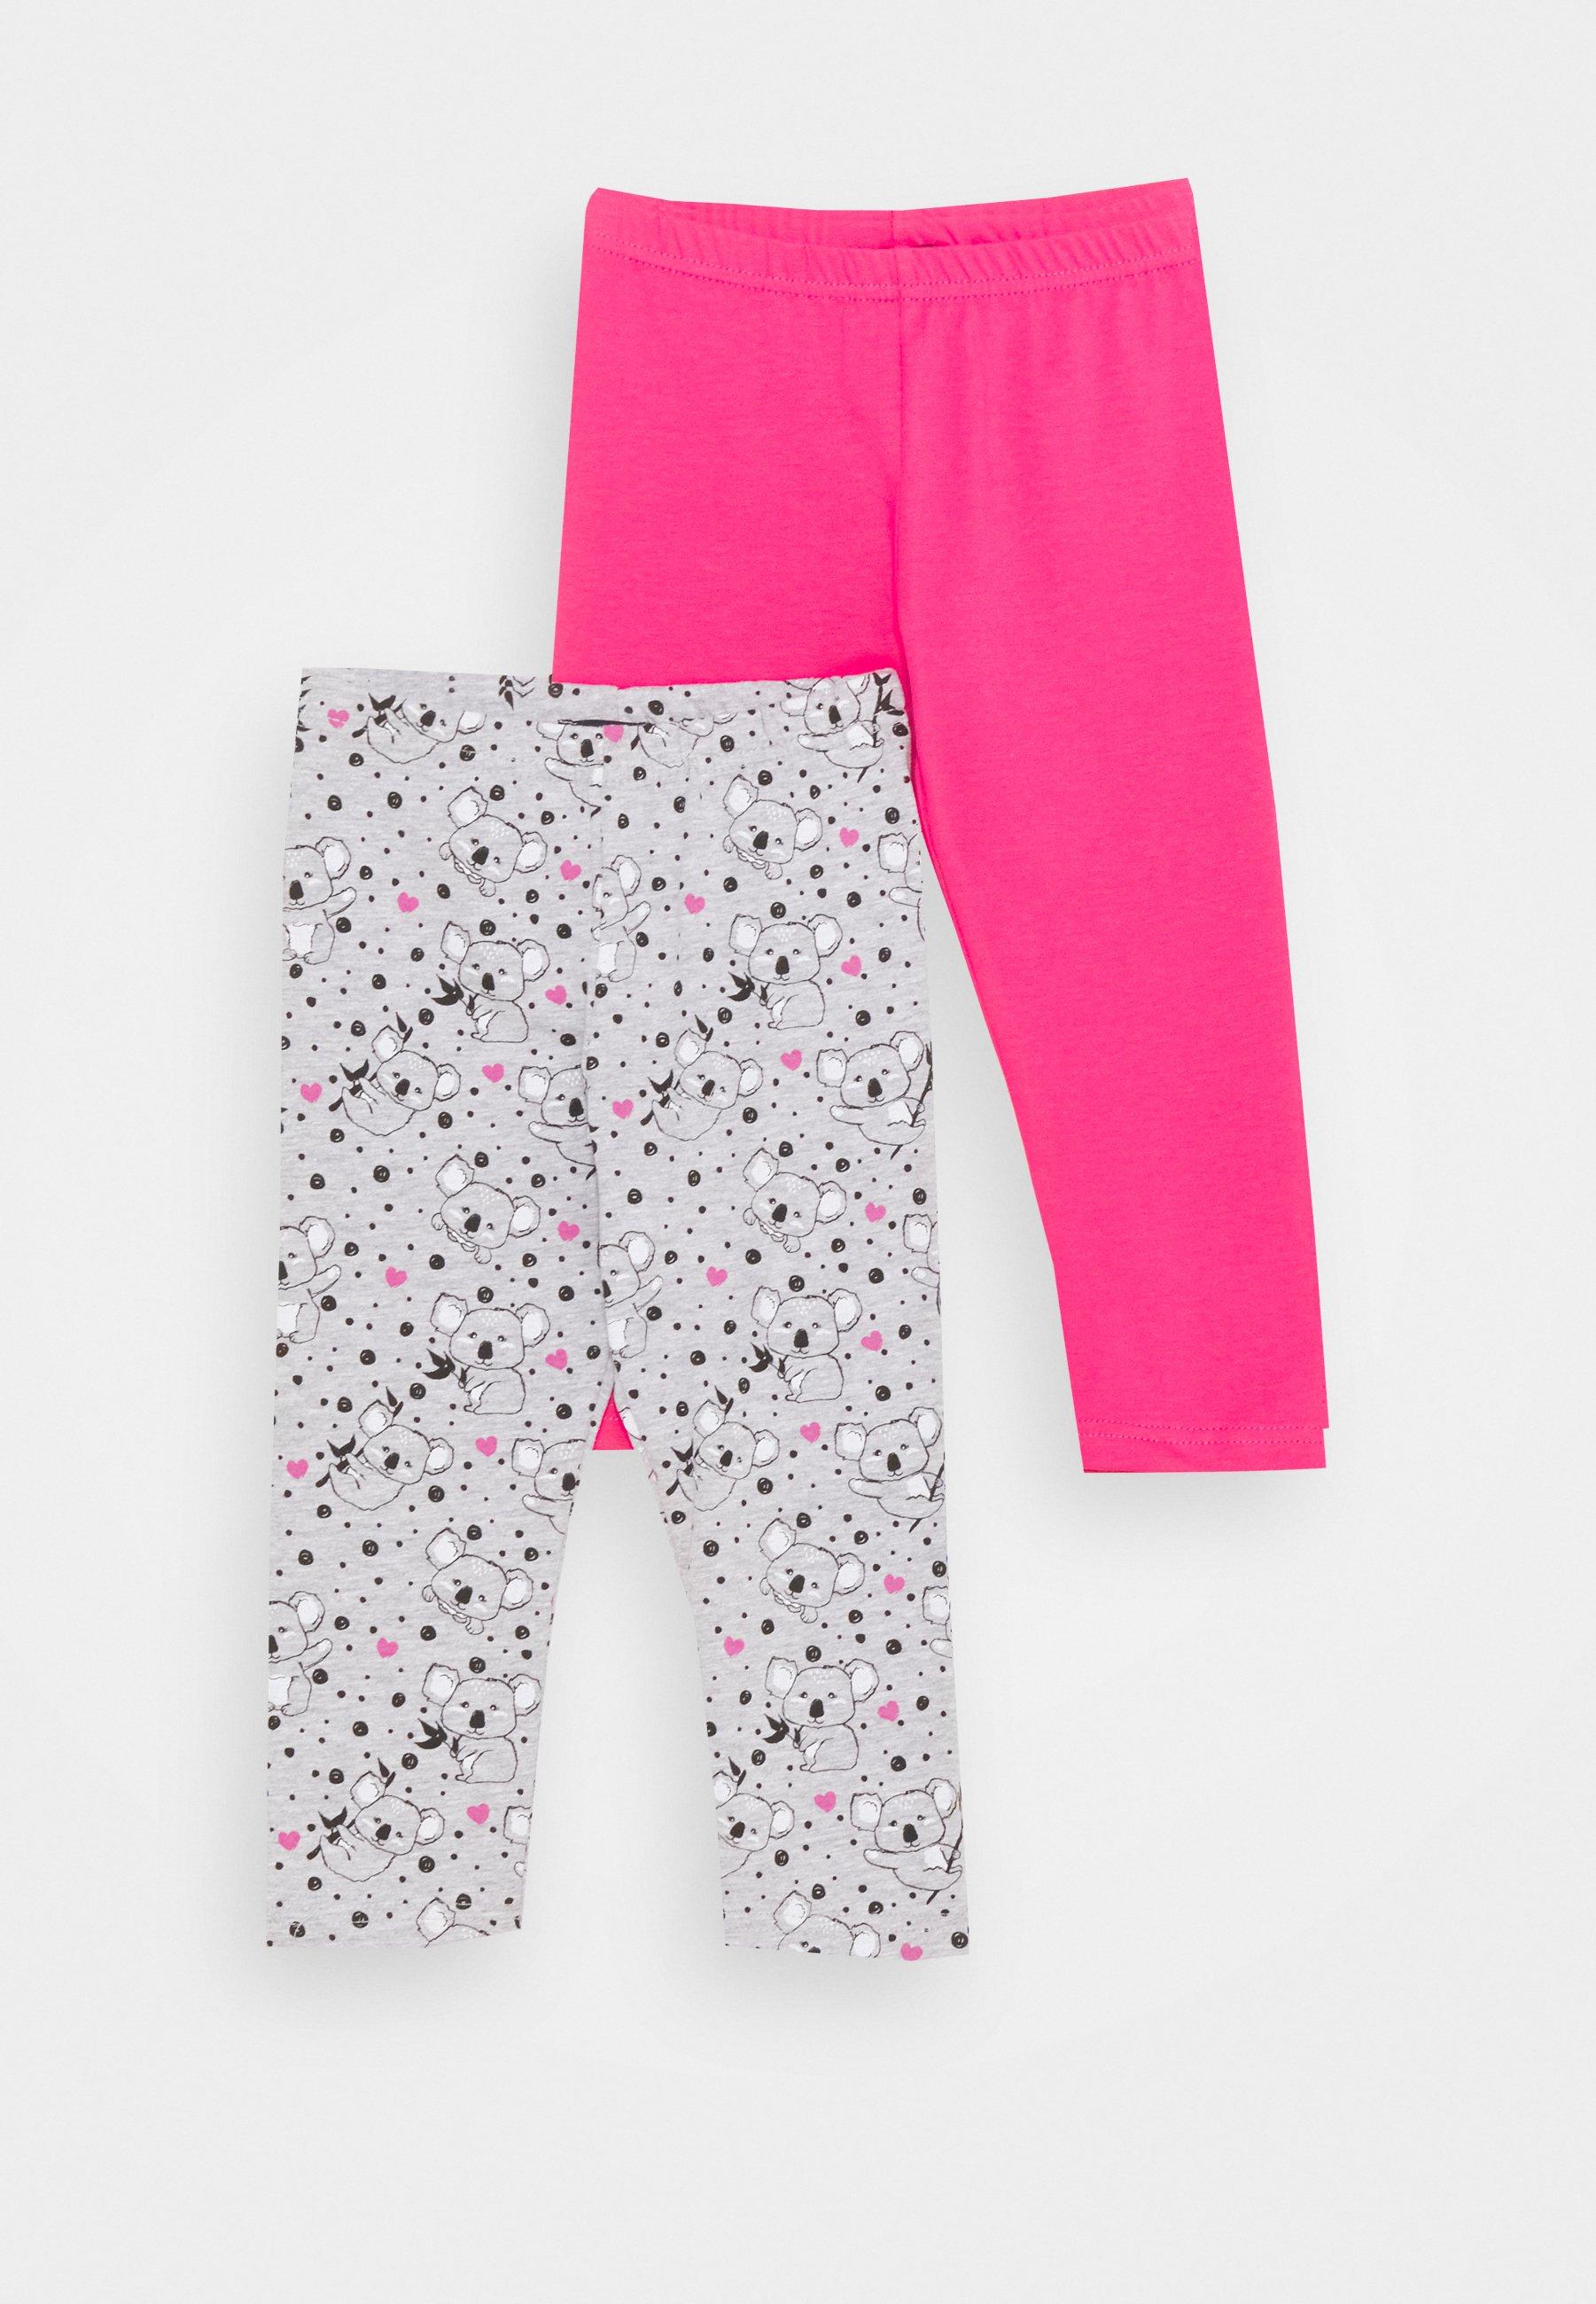 Kids SMALL GIRLS TROUSERS KOALA 2 PACK - Leggings - Trousers